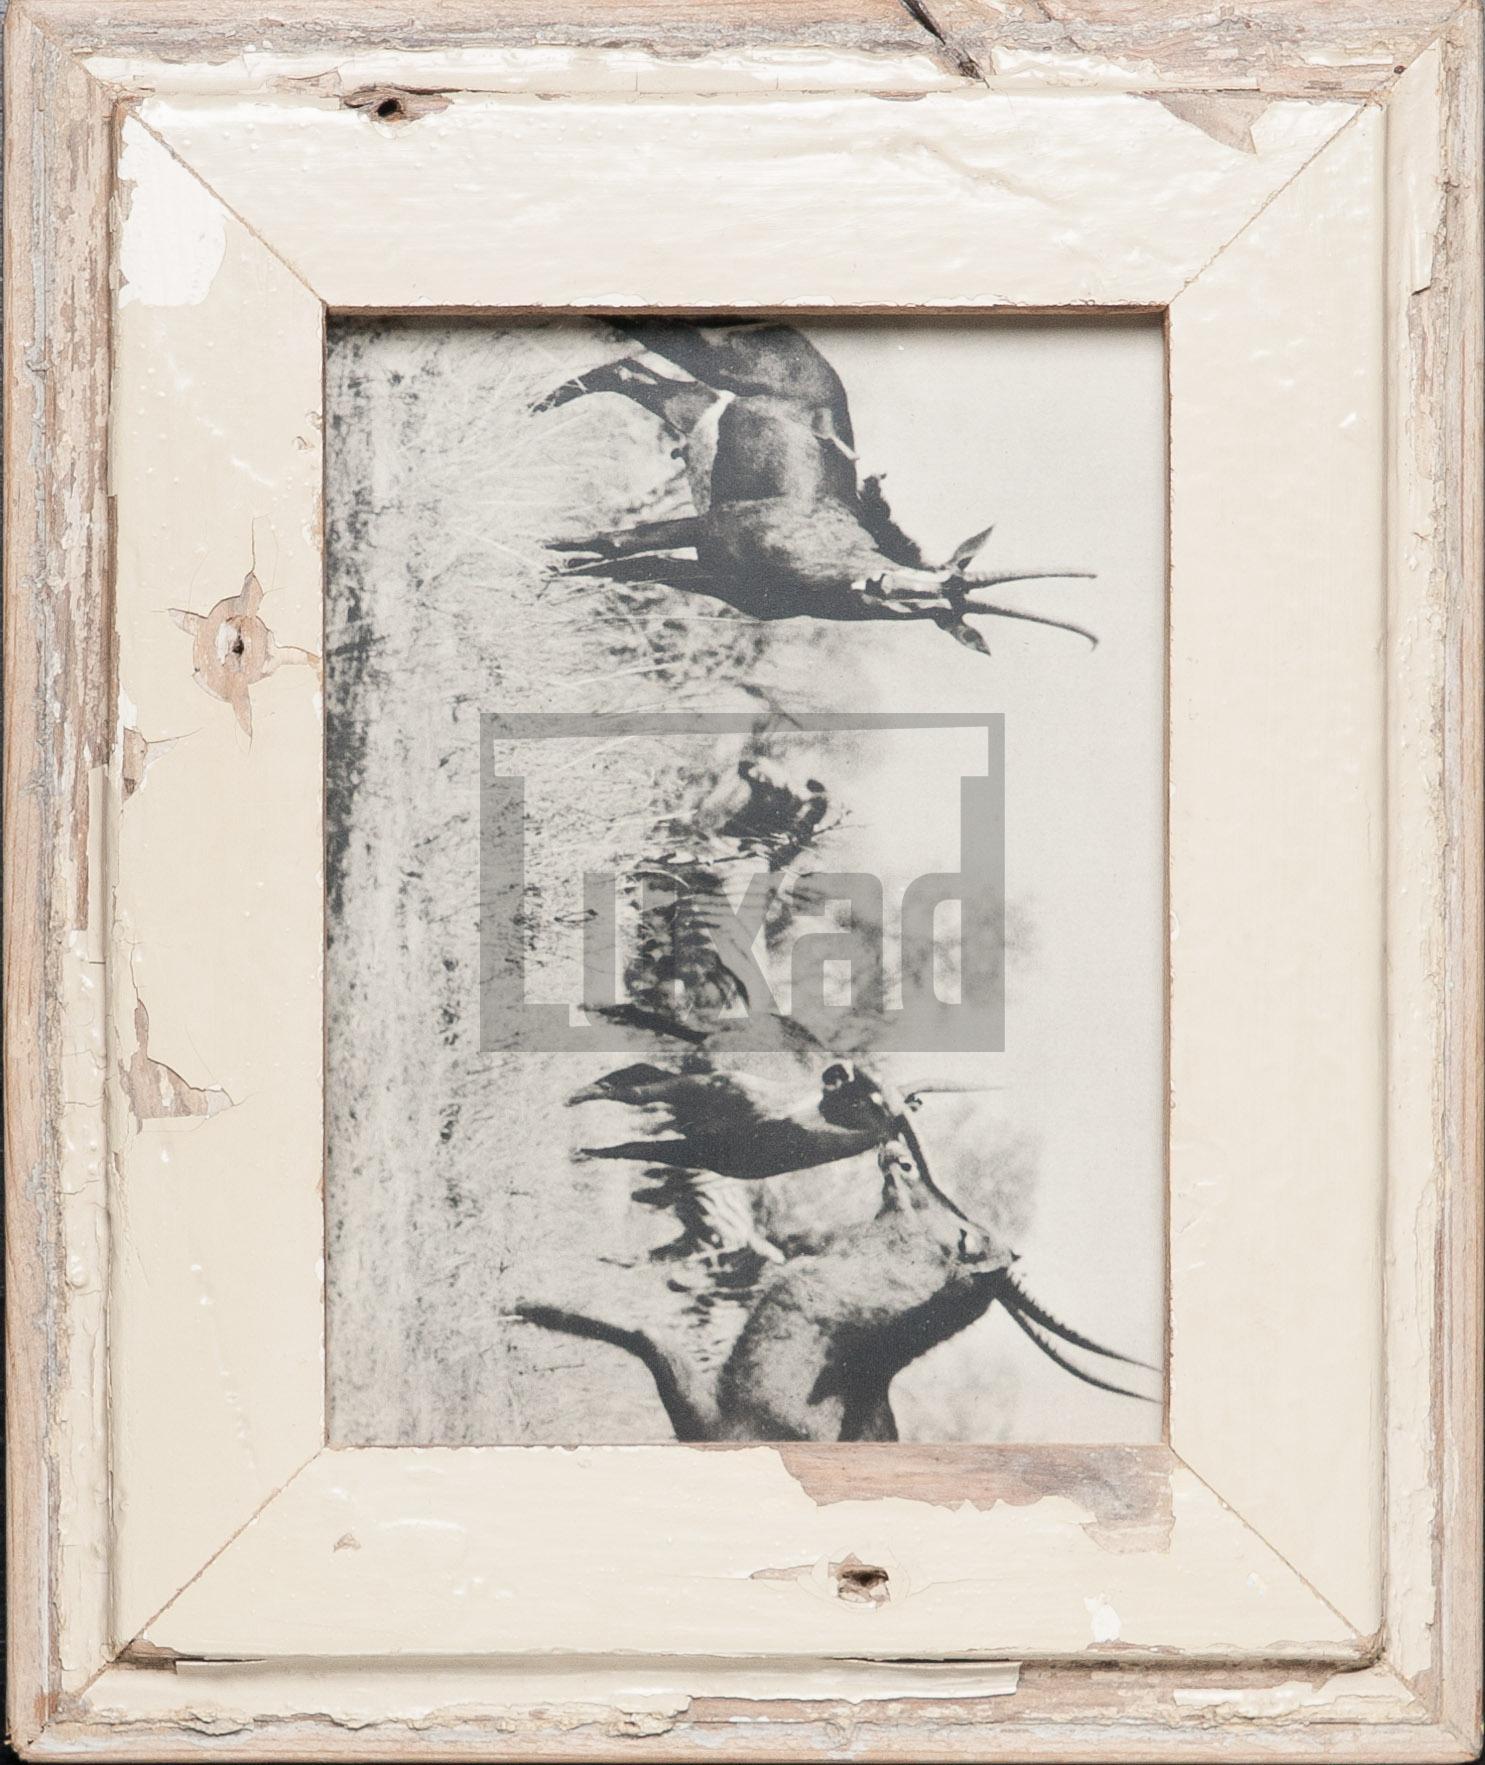 Vintage-Bilderrahmen aus altem Holz für Fotos 15 x 20 cm